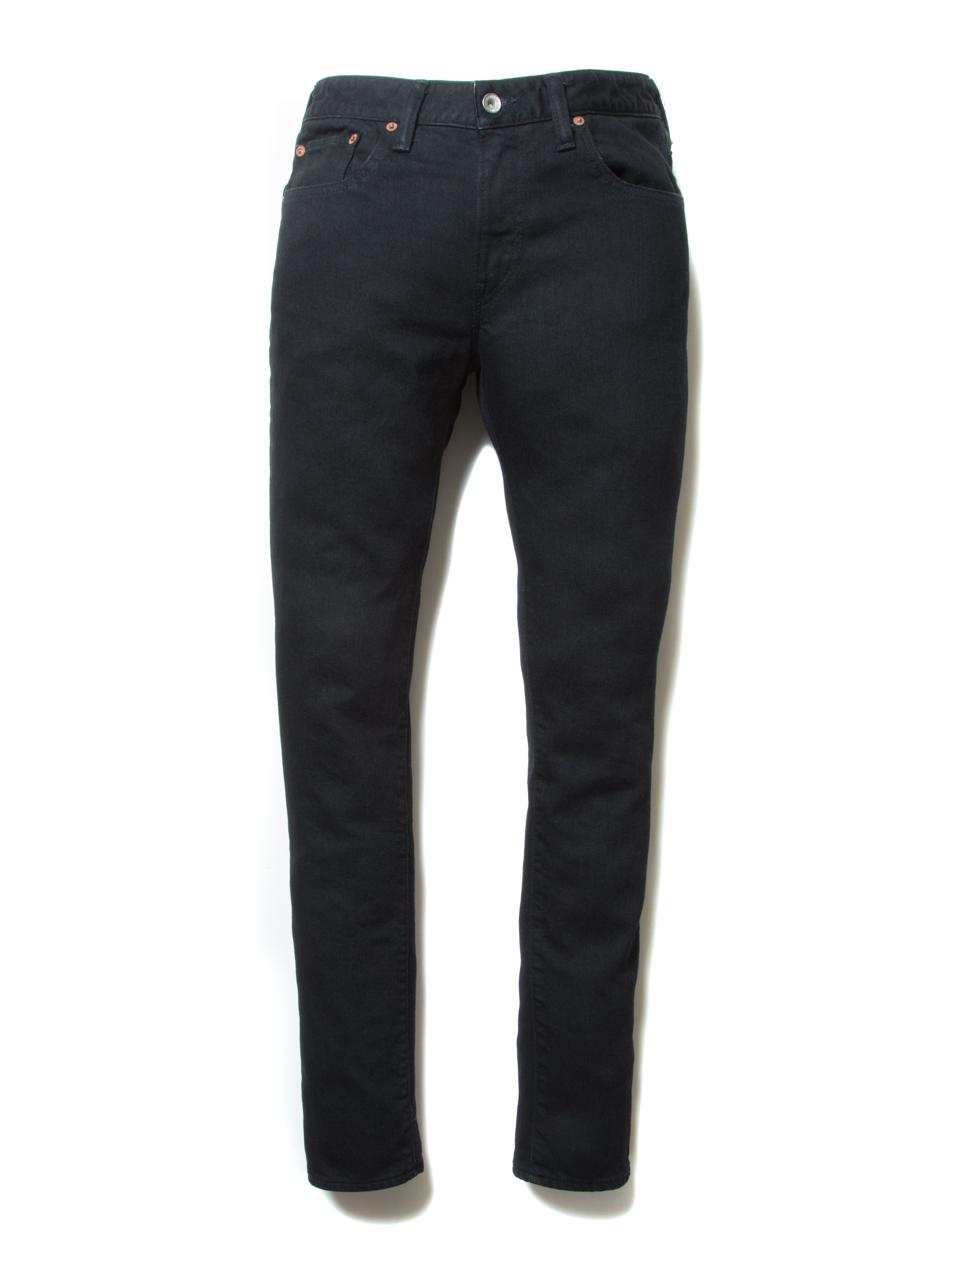 5 Pocket Skinny Denim-Black-